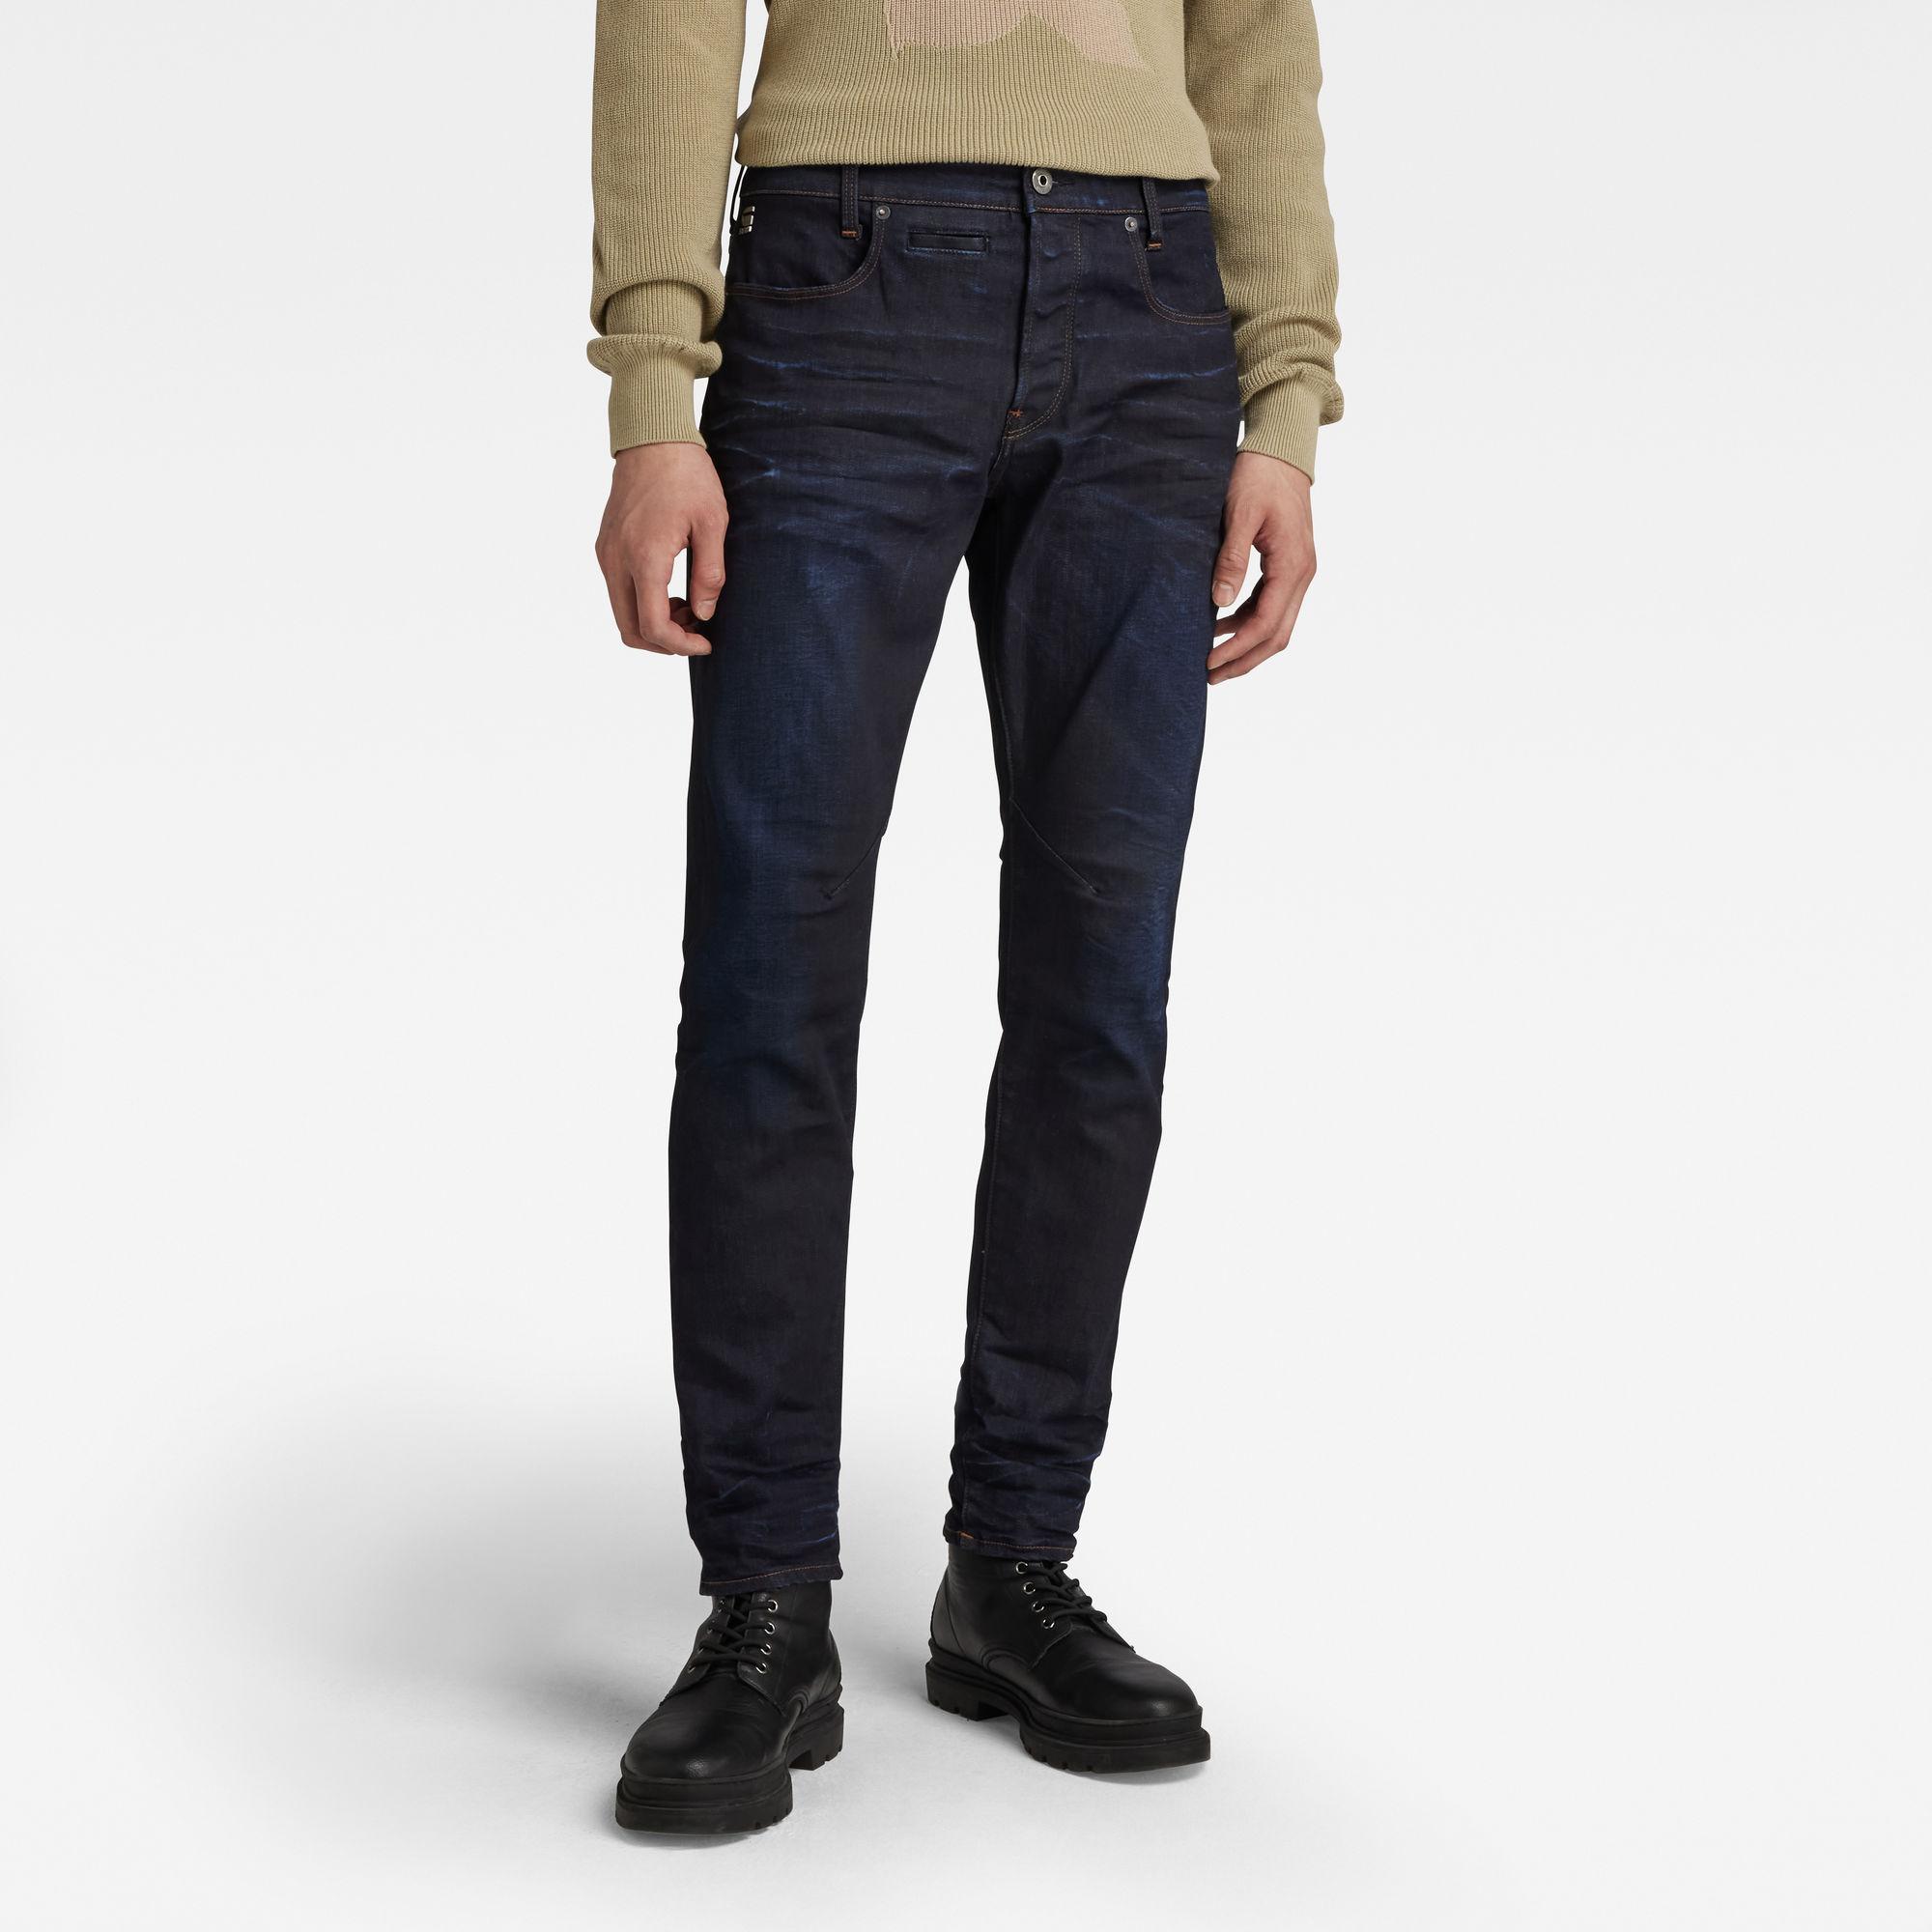 G-Star RAW Heren D-Staq 5-Pocket Slim Jeans Donkerblauw